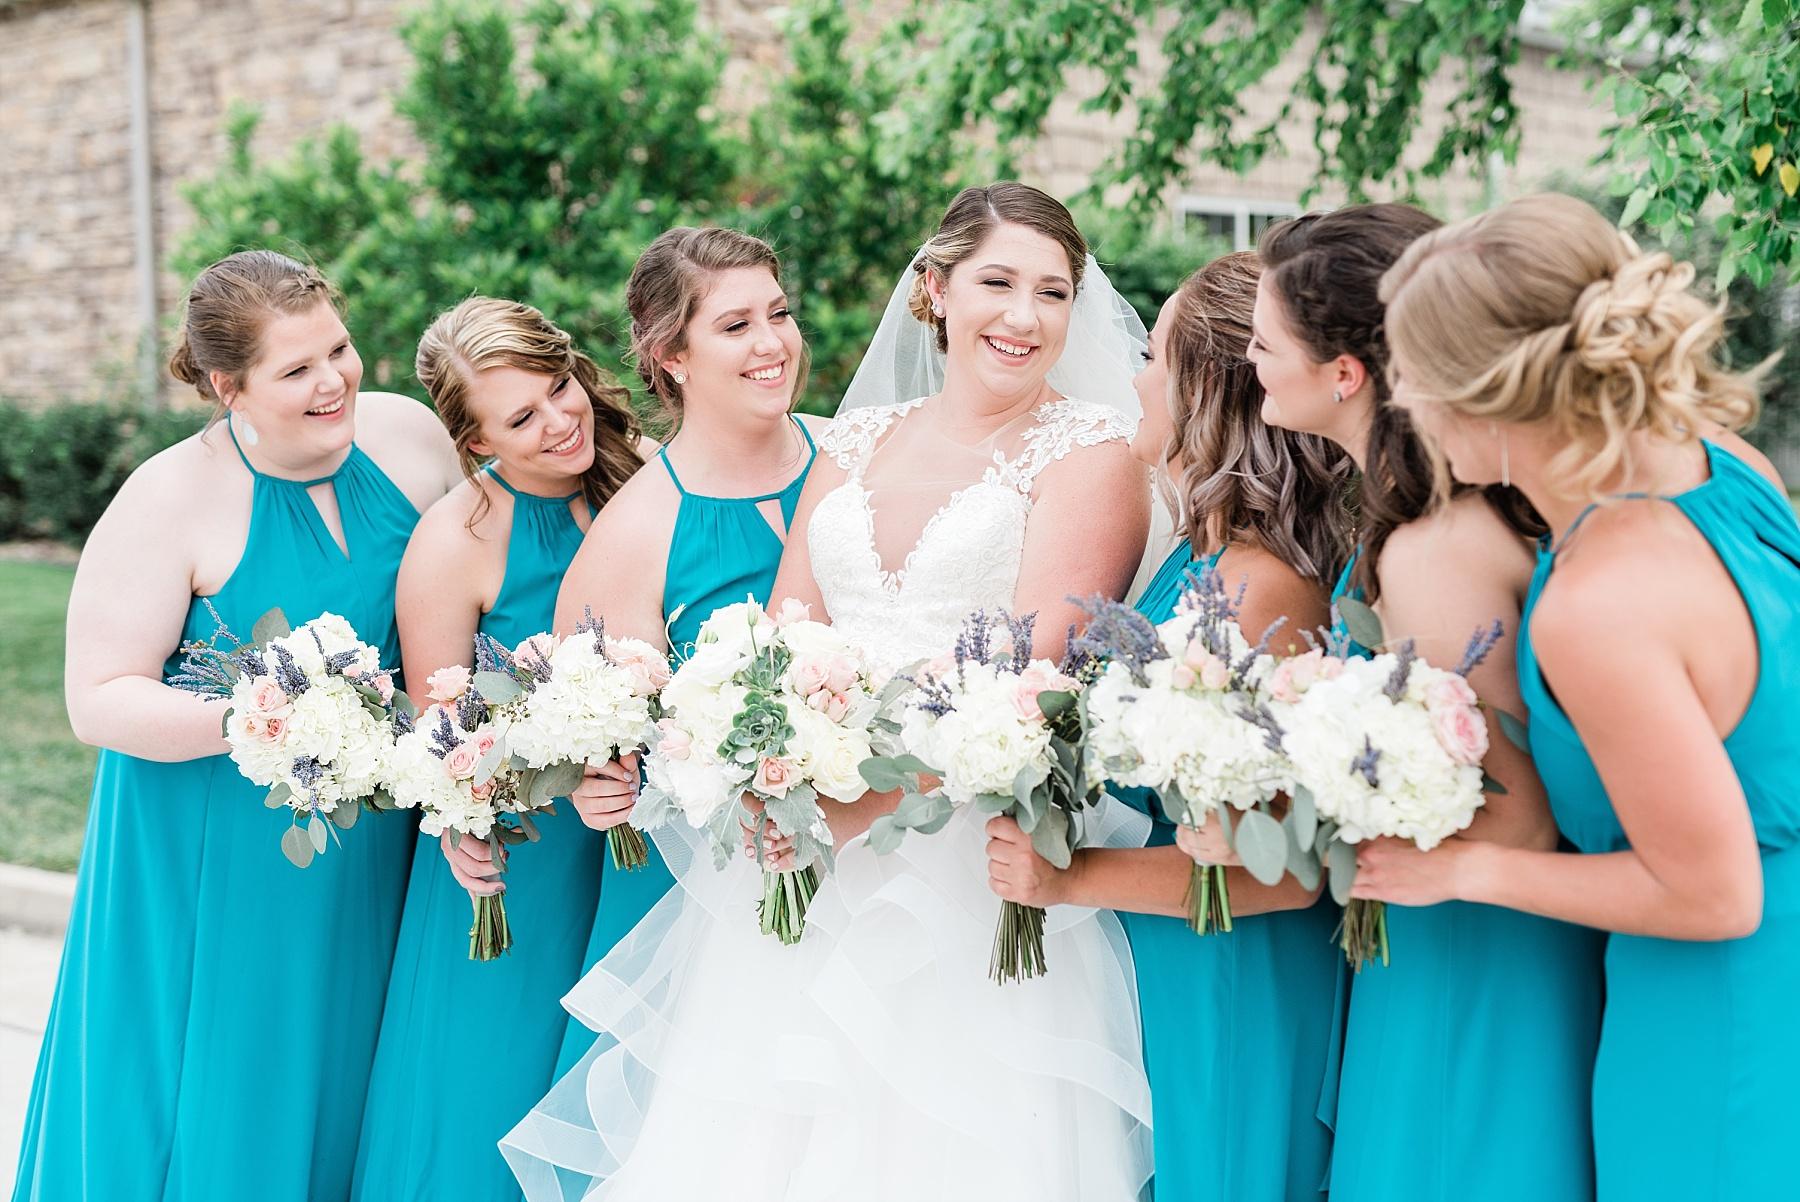 Baurichter Wedding at Stoney Creek Inn Columbia Missouri by Kelsi Kliethermes Photography_0005.jpg